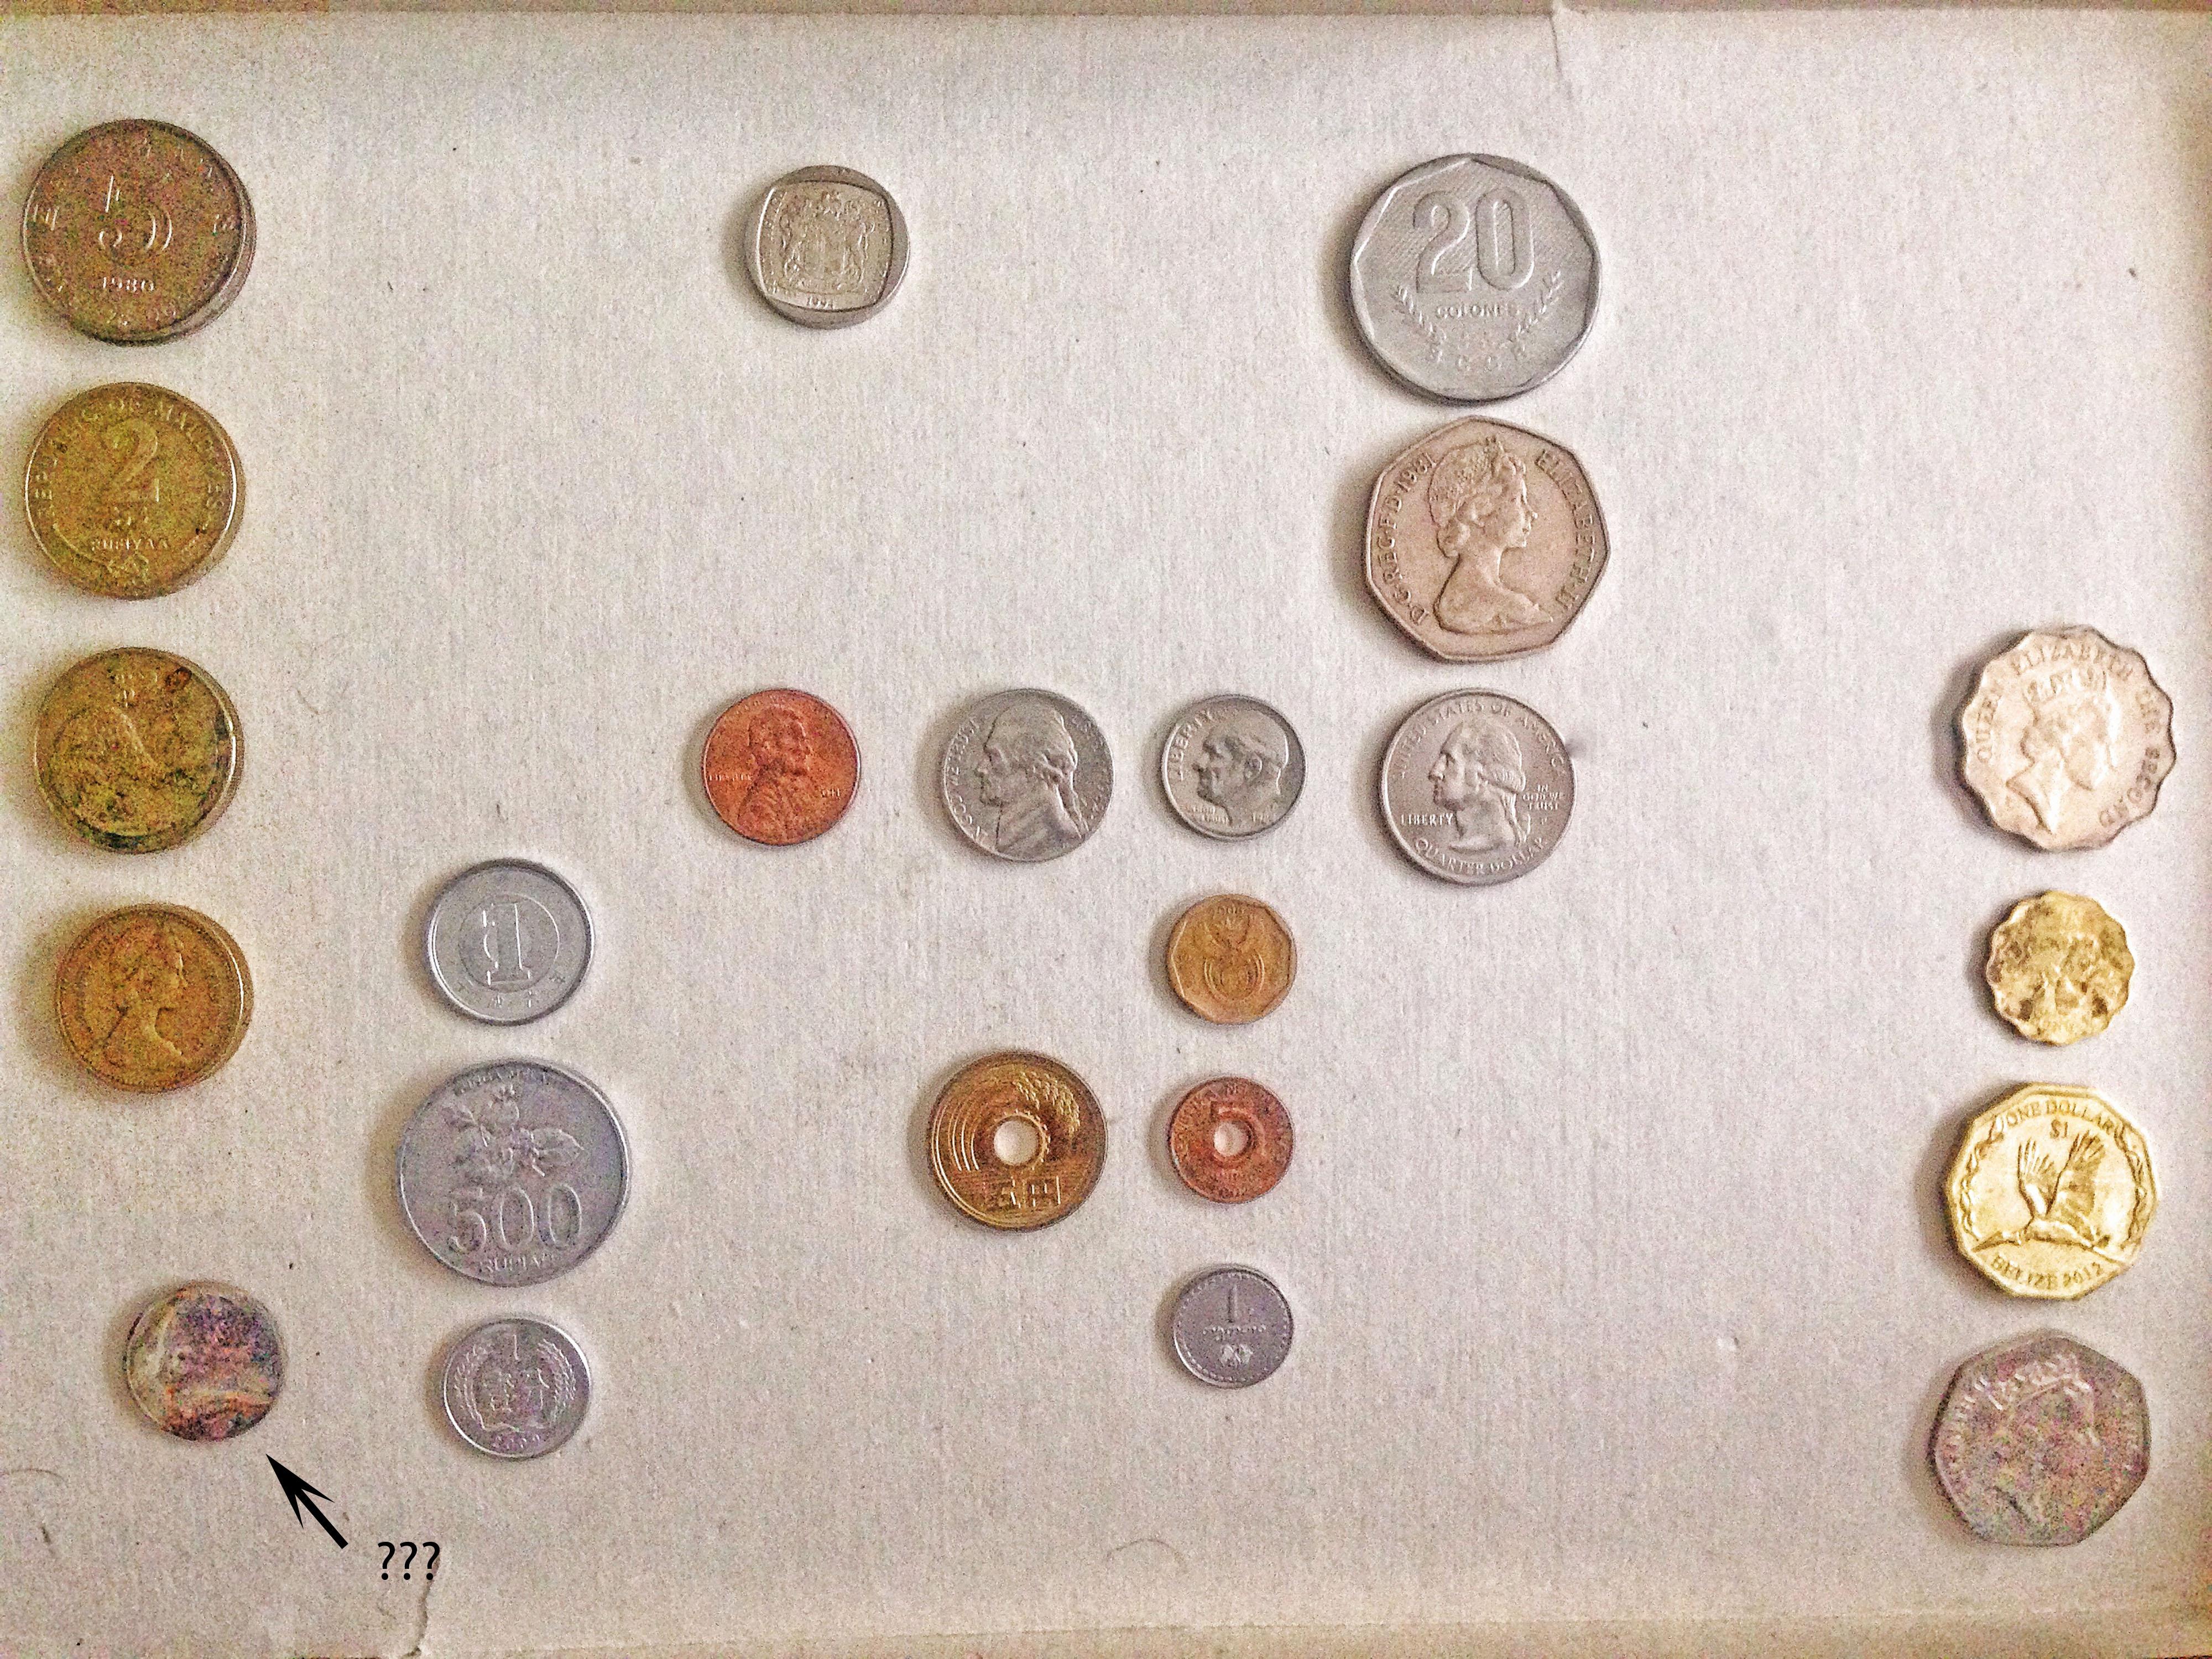 Money (Coin) Collection - Numismatist 1